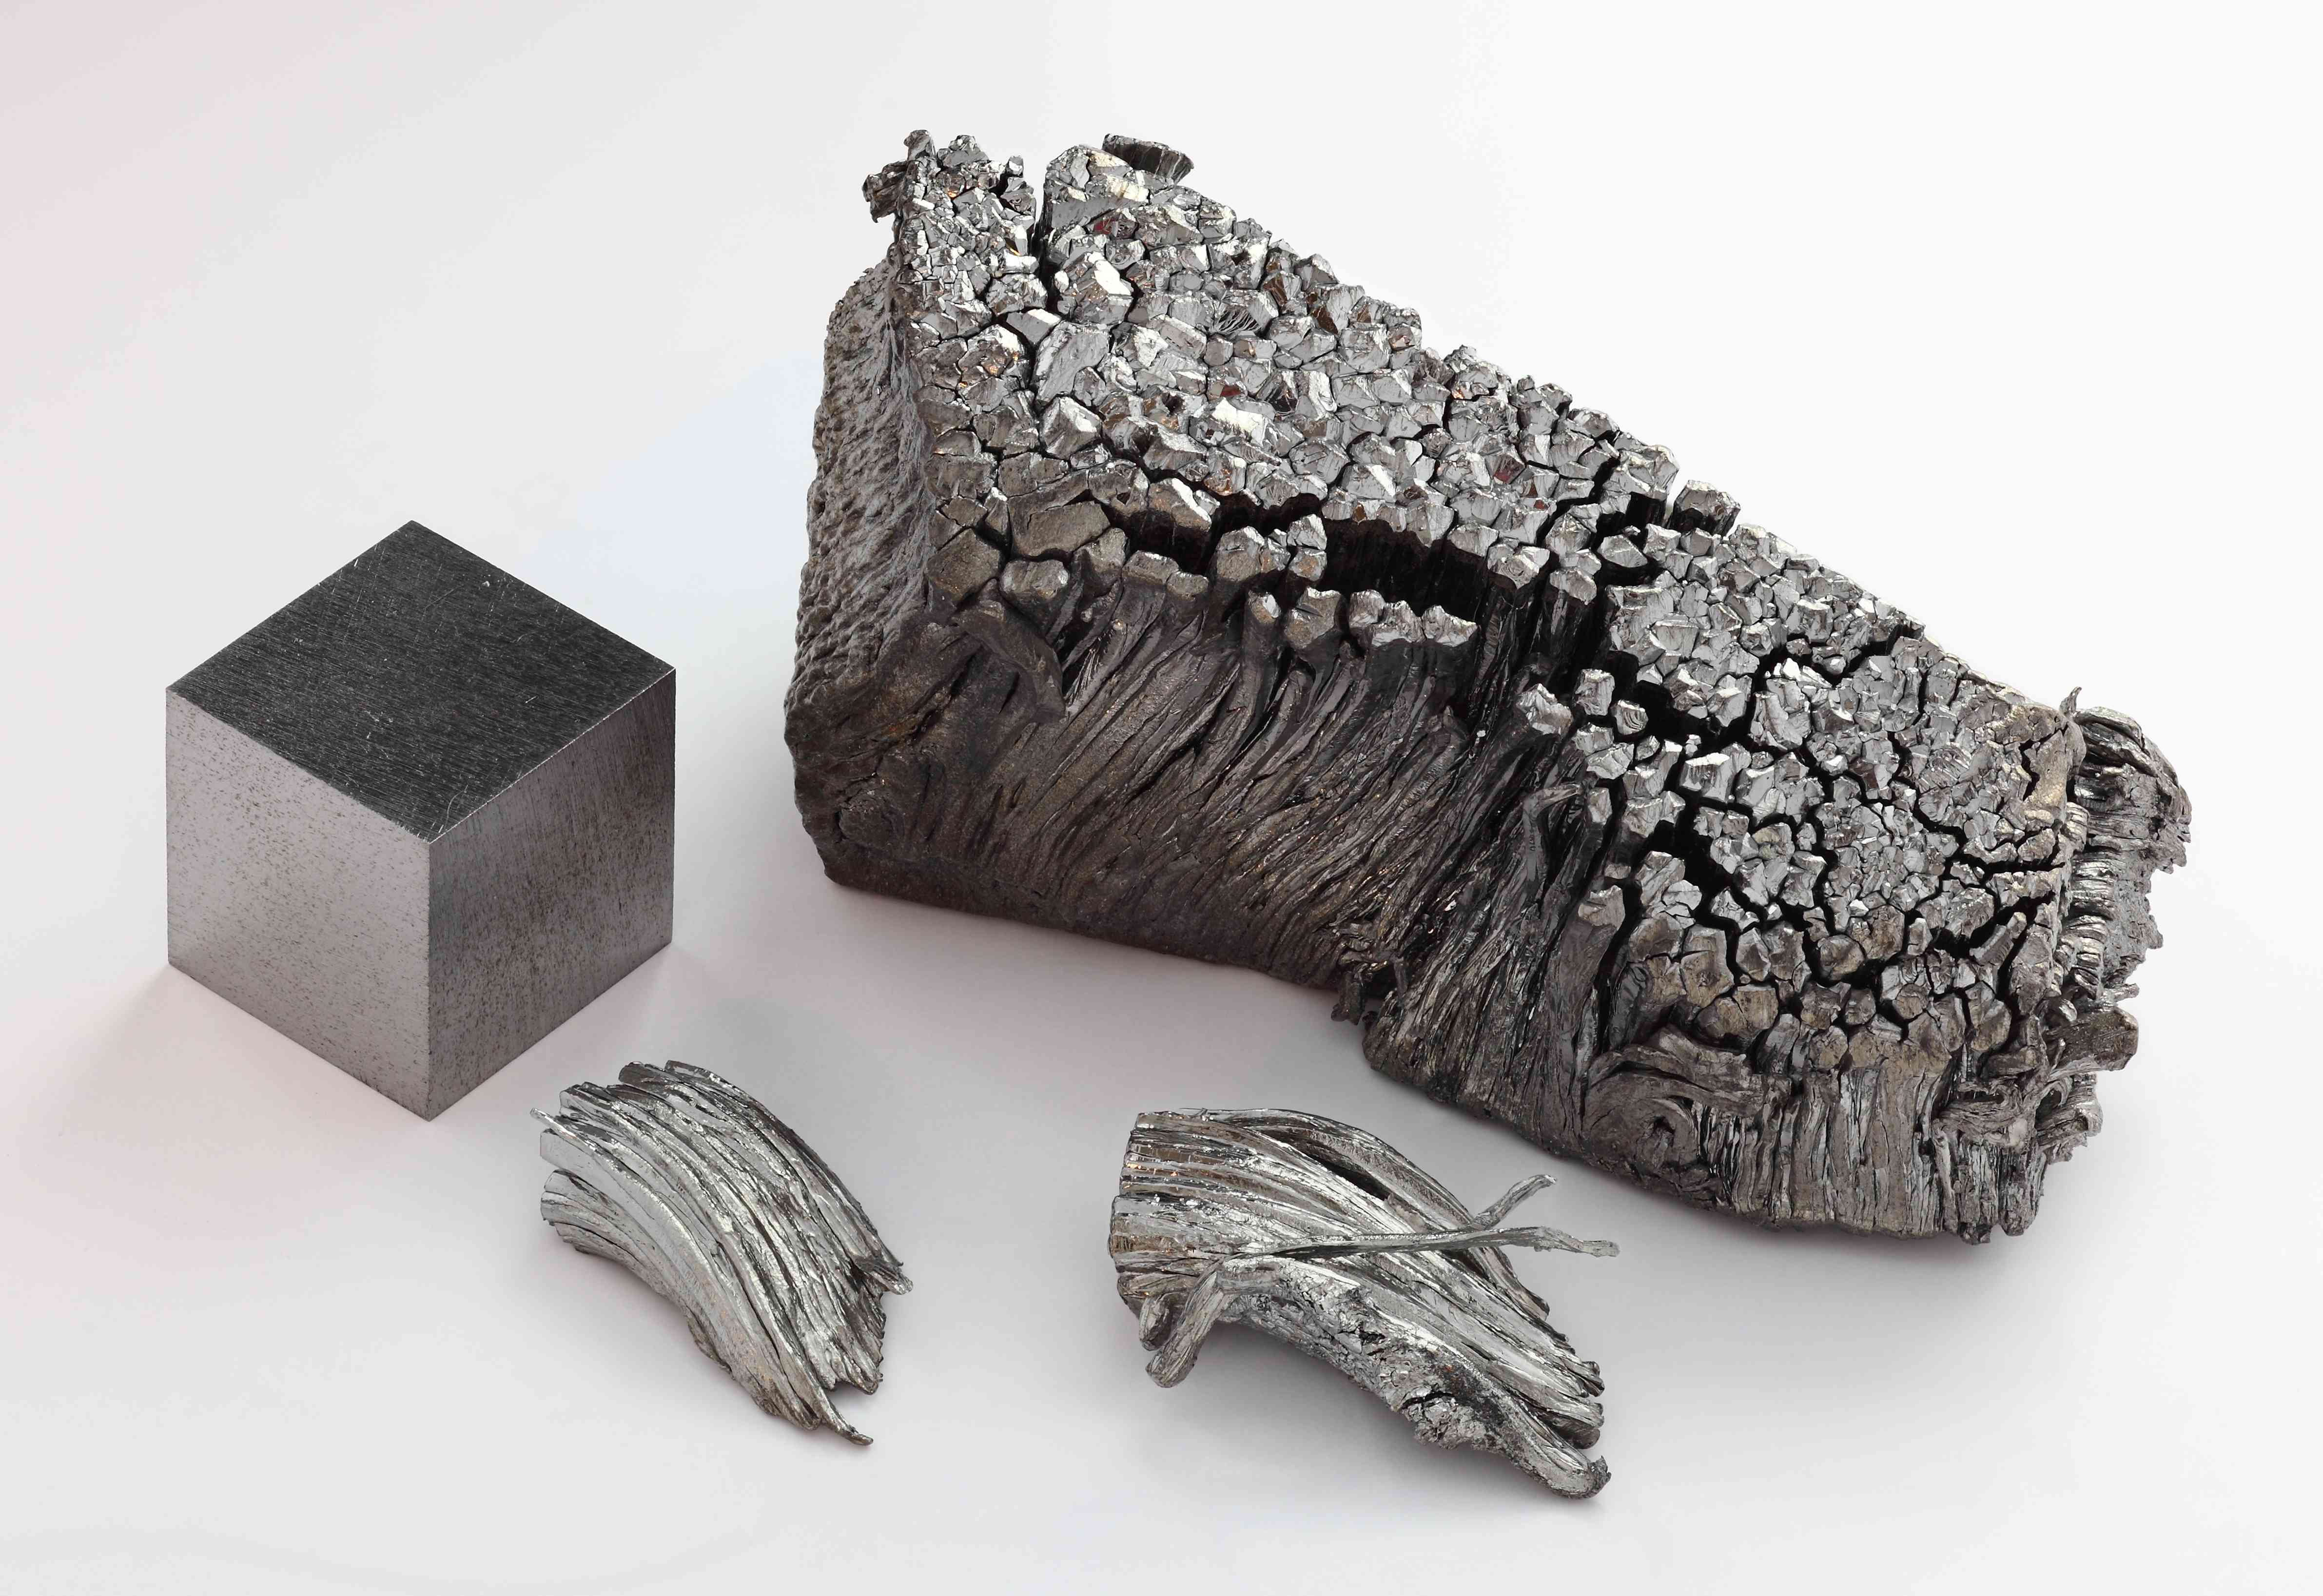 Thulium metal